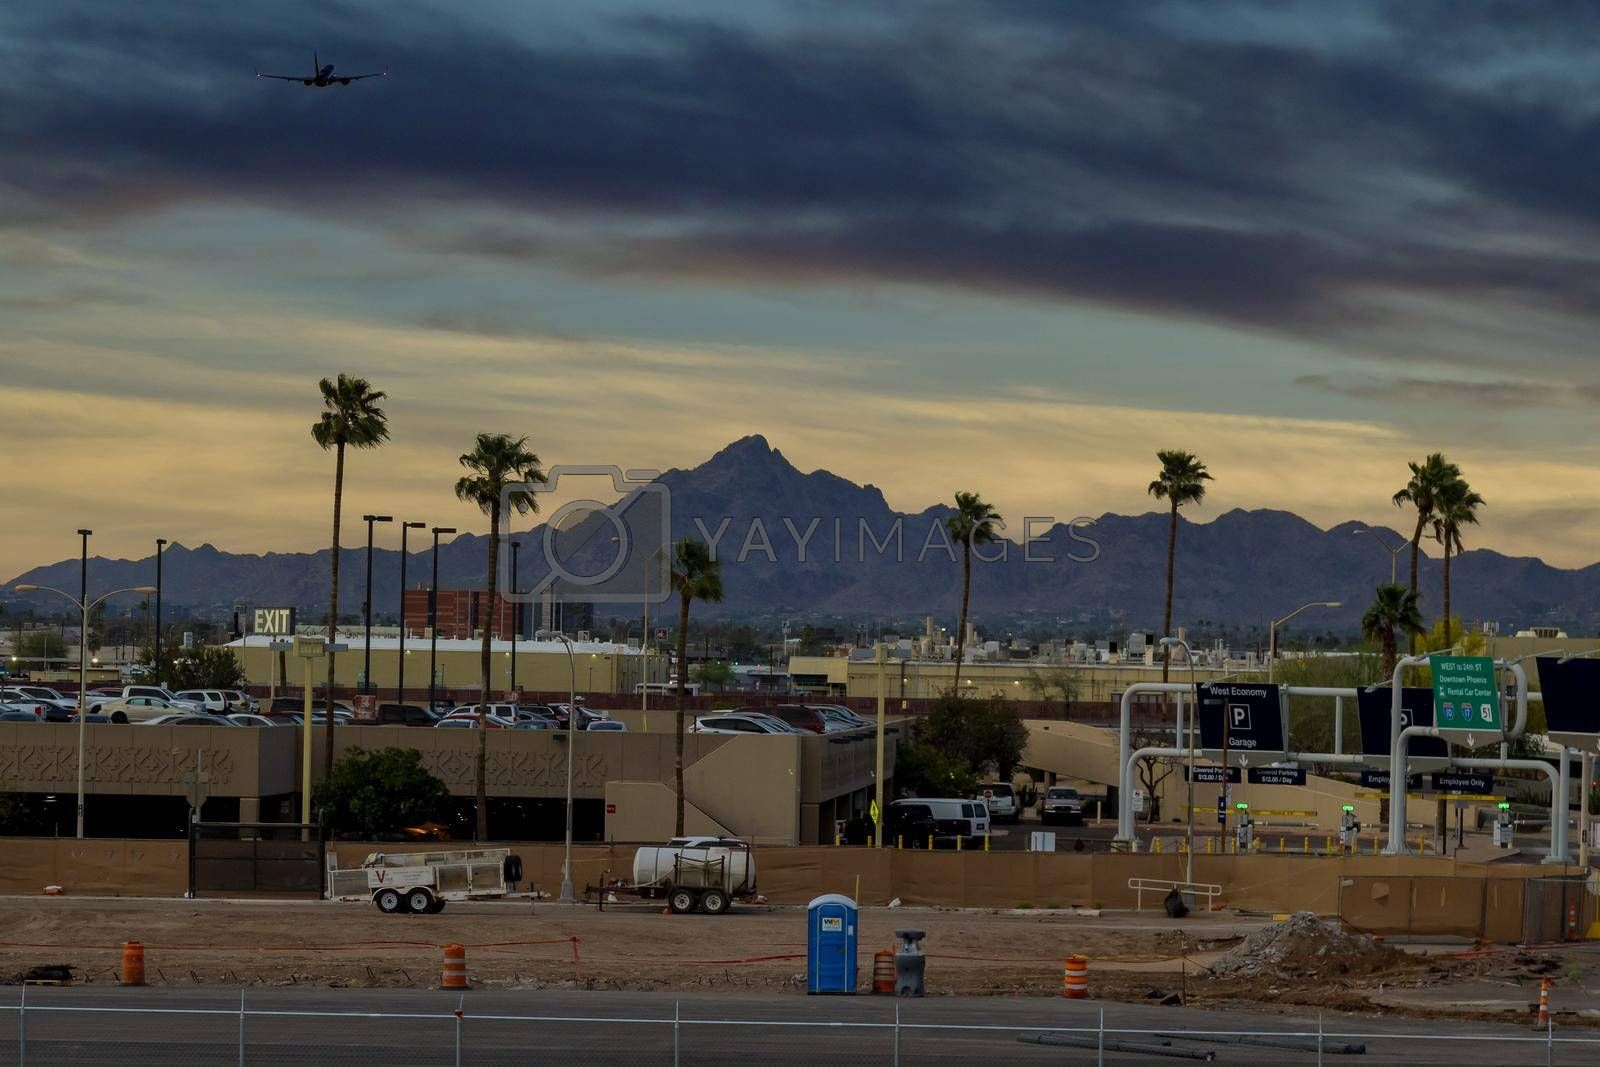 05.Apryl 2021 Phoenix, Arizona USA: Modern international airport during sunset a passenger plane in flight away in to sky on Sky Harbor airport with Phoenix, Arizona USA